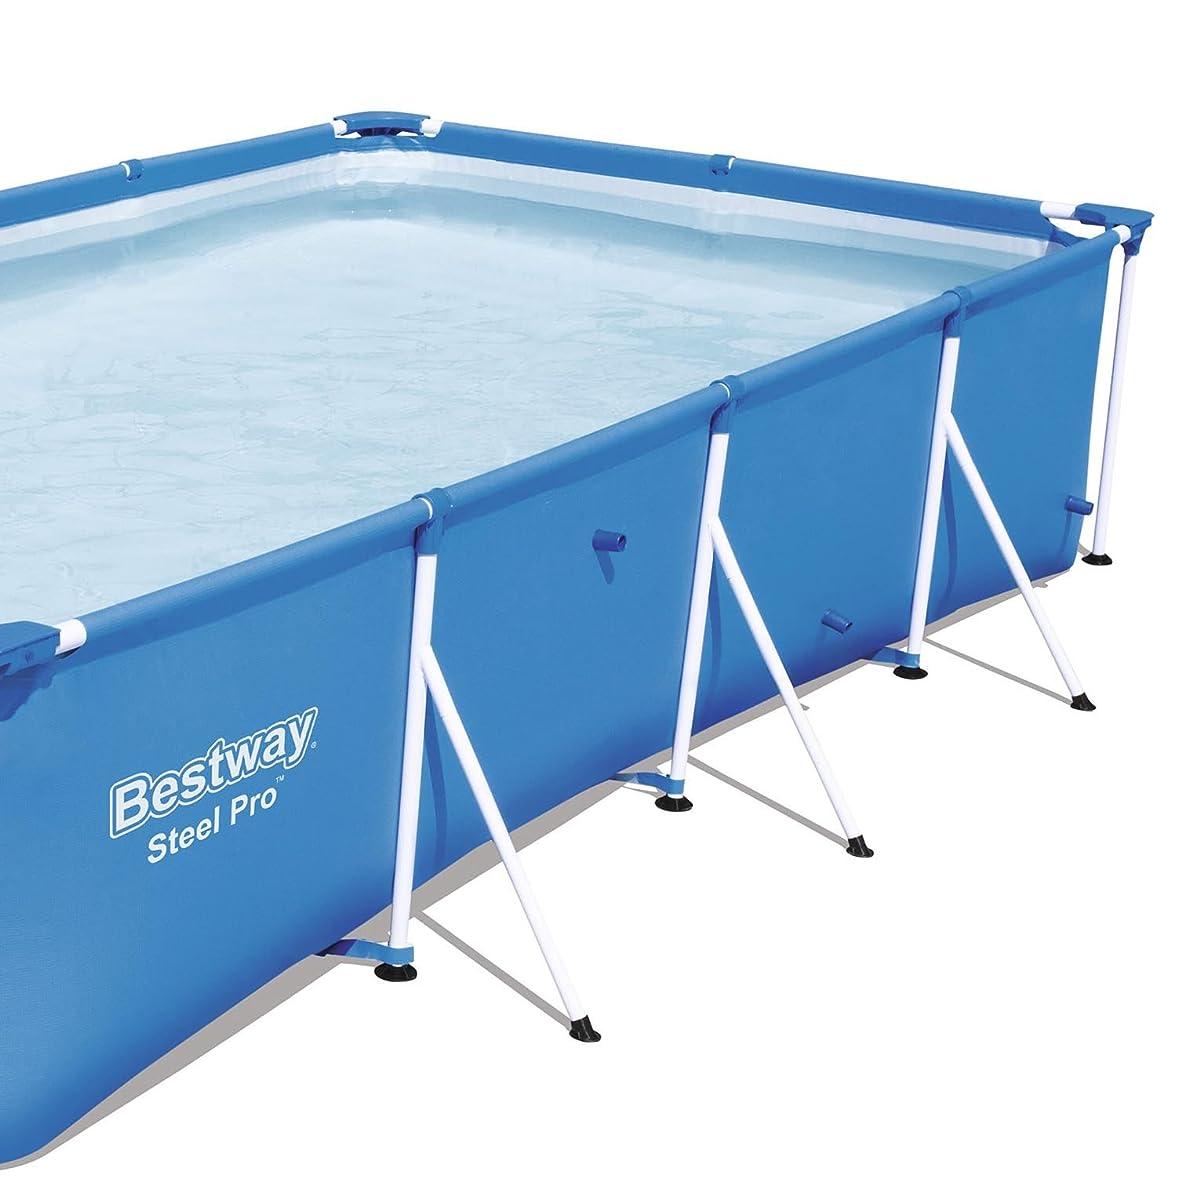 Bestway Steel Pro 157 x 83 x 32 Rectangular Frame Above Ground Swimming Pool